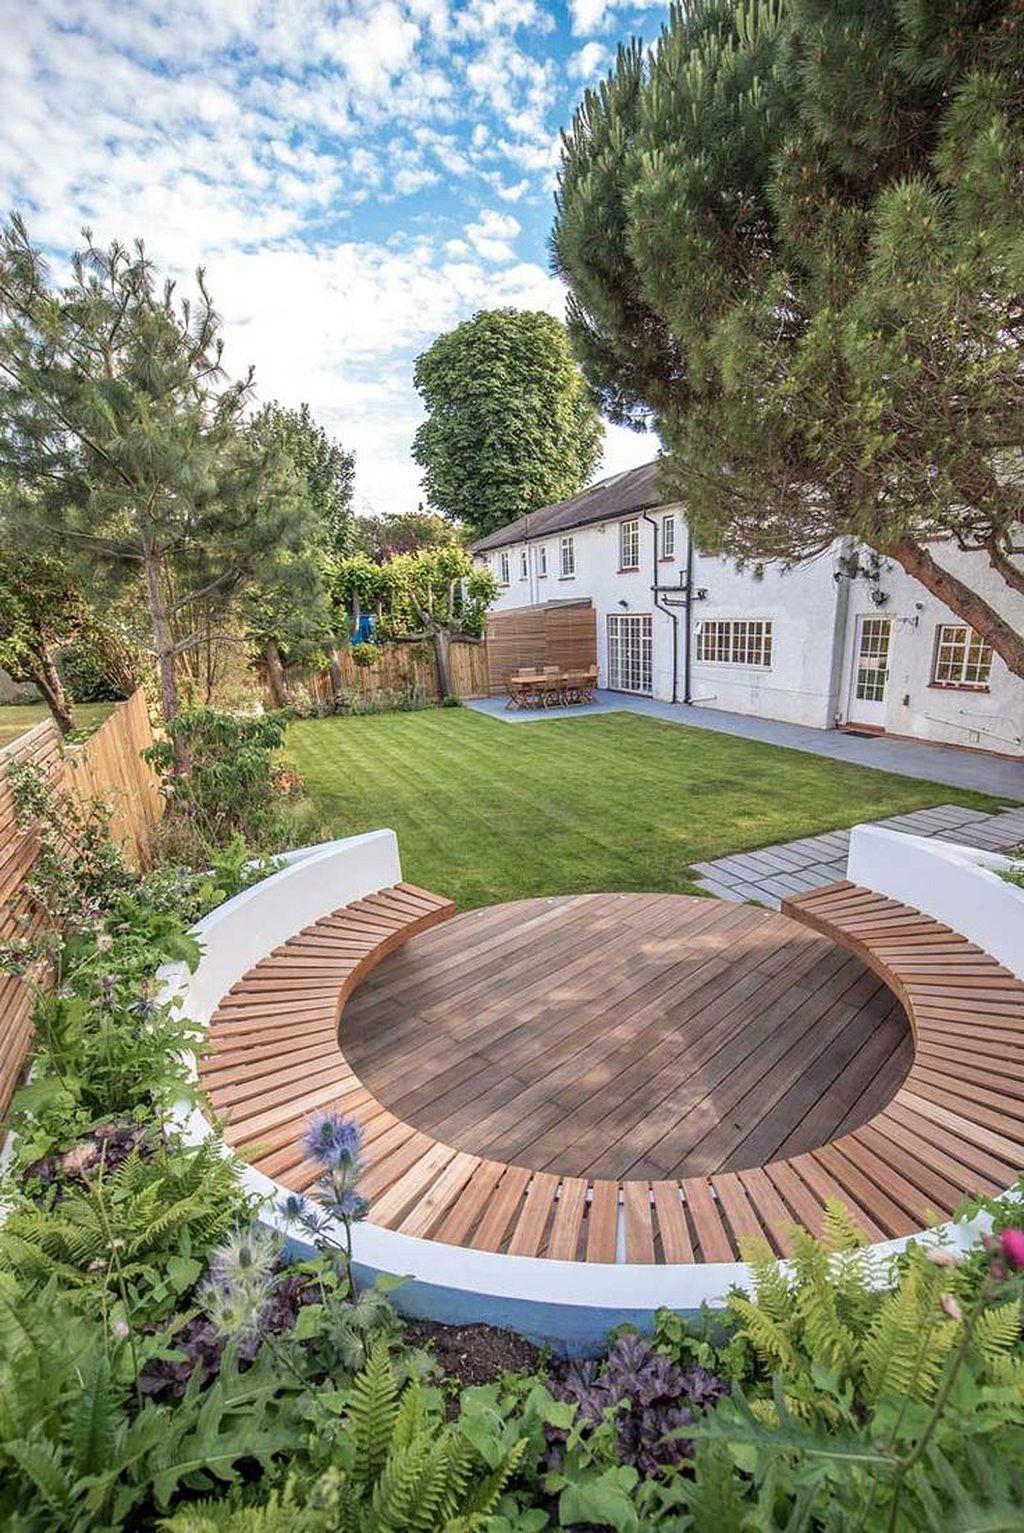 169 modern garden design ideas